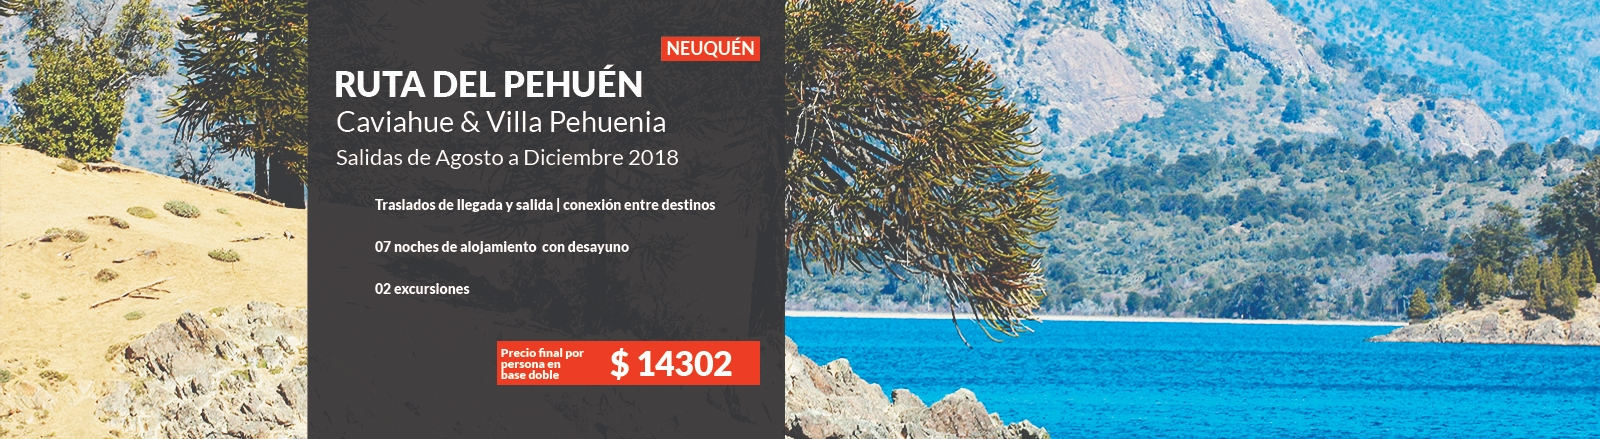 La ruta del Pehuén - Caviahue & Pehuenia